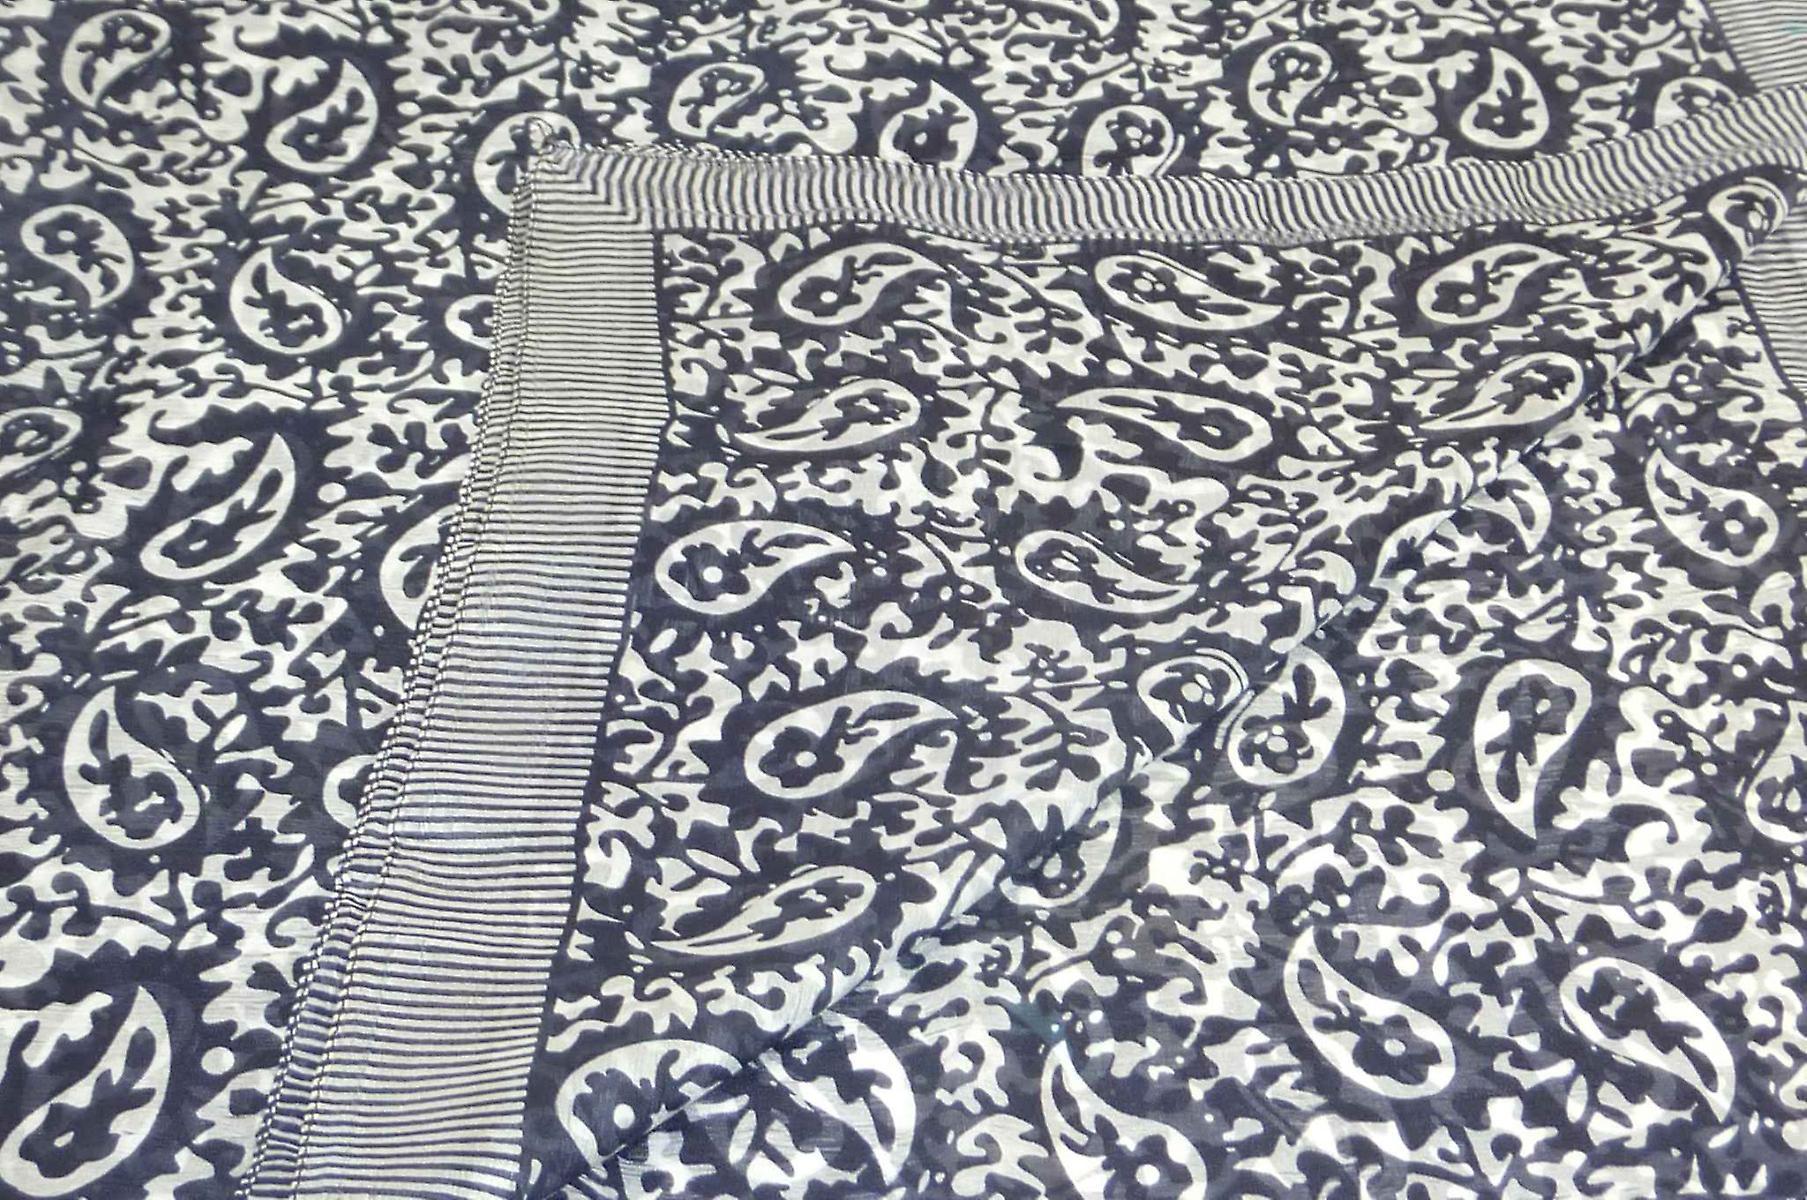 Mulberry Silk Classic Square Scarf Amba Black & White by Pashmina & Silk